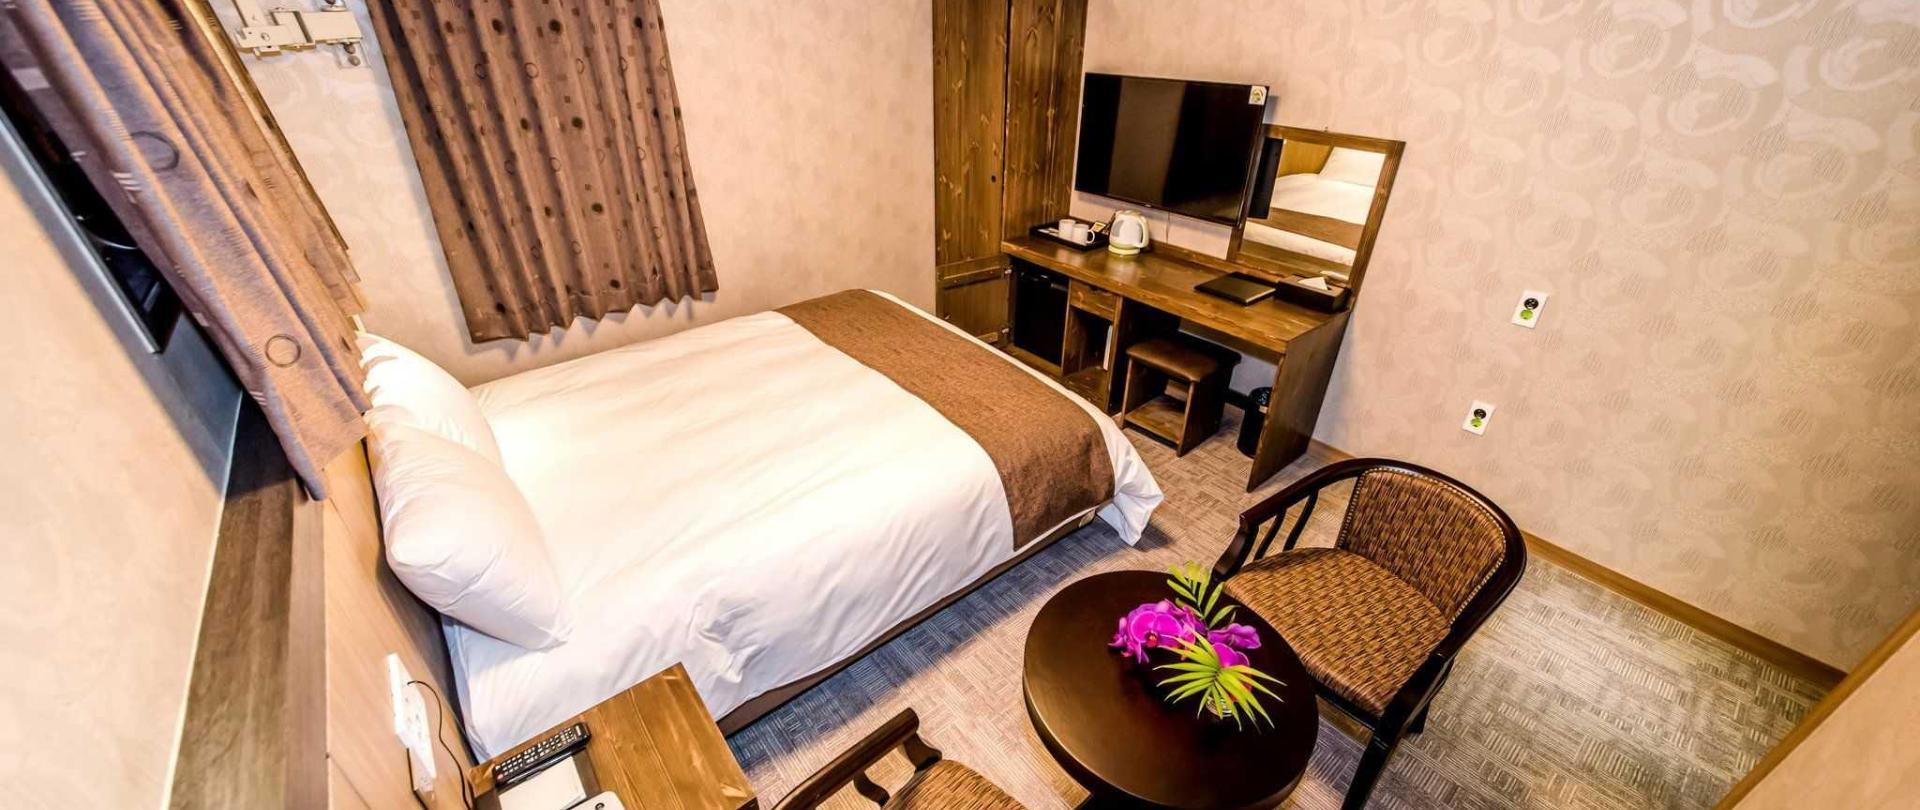 j-dream-hotel-08.jpg